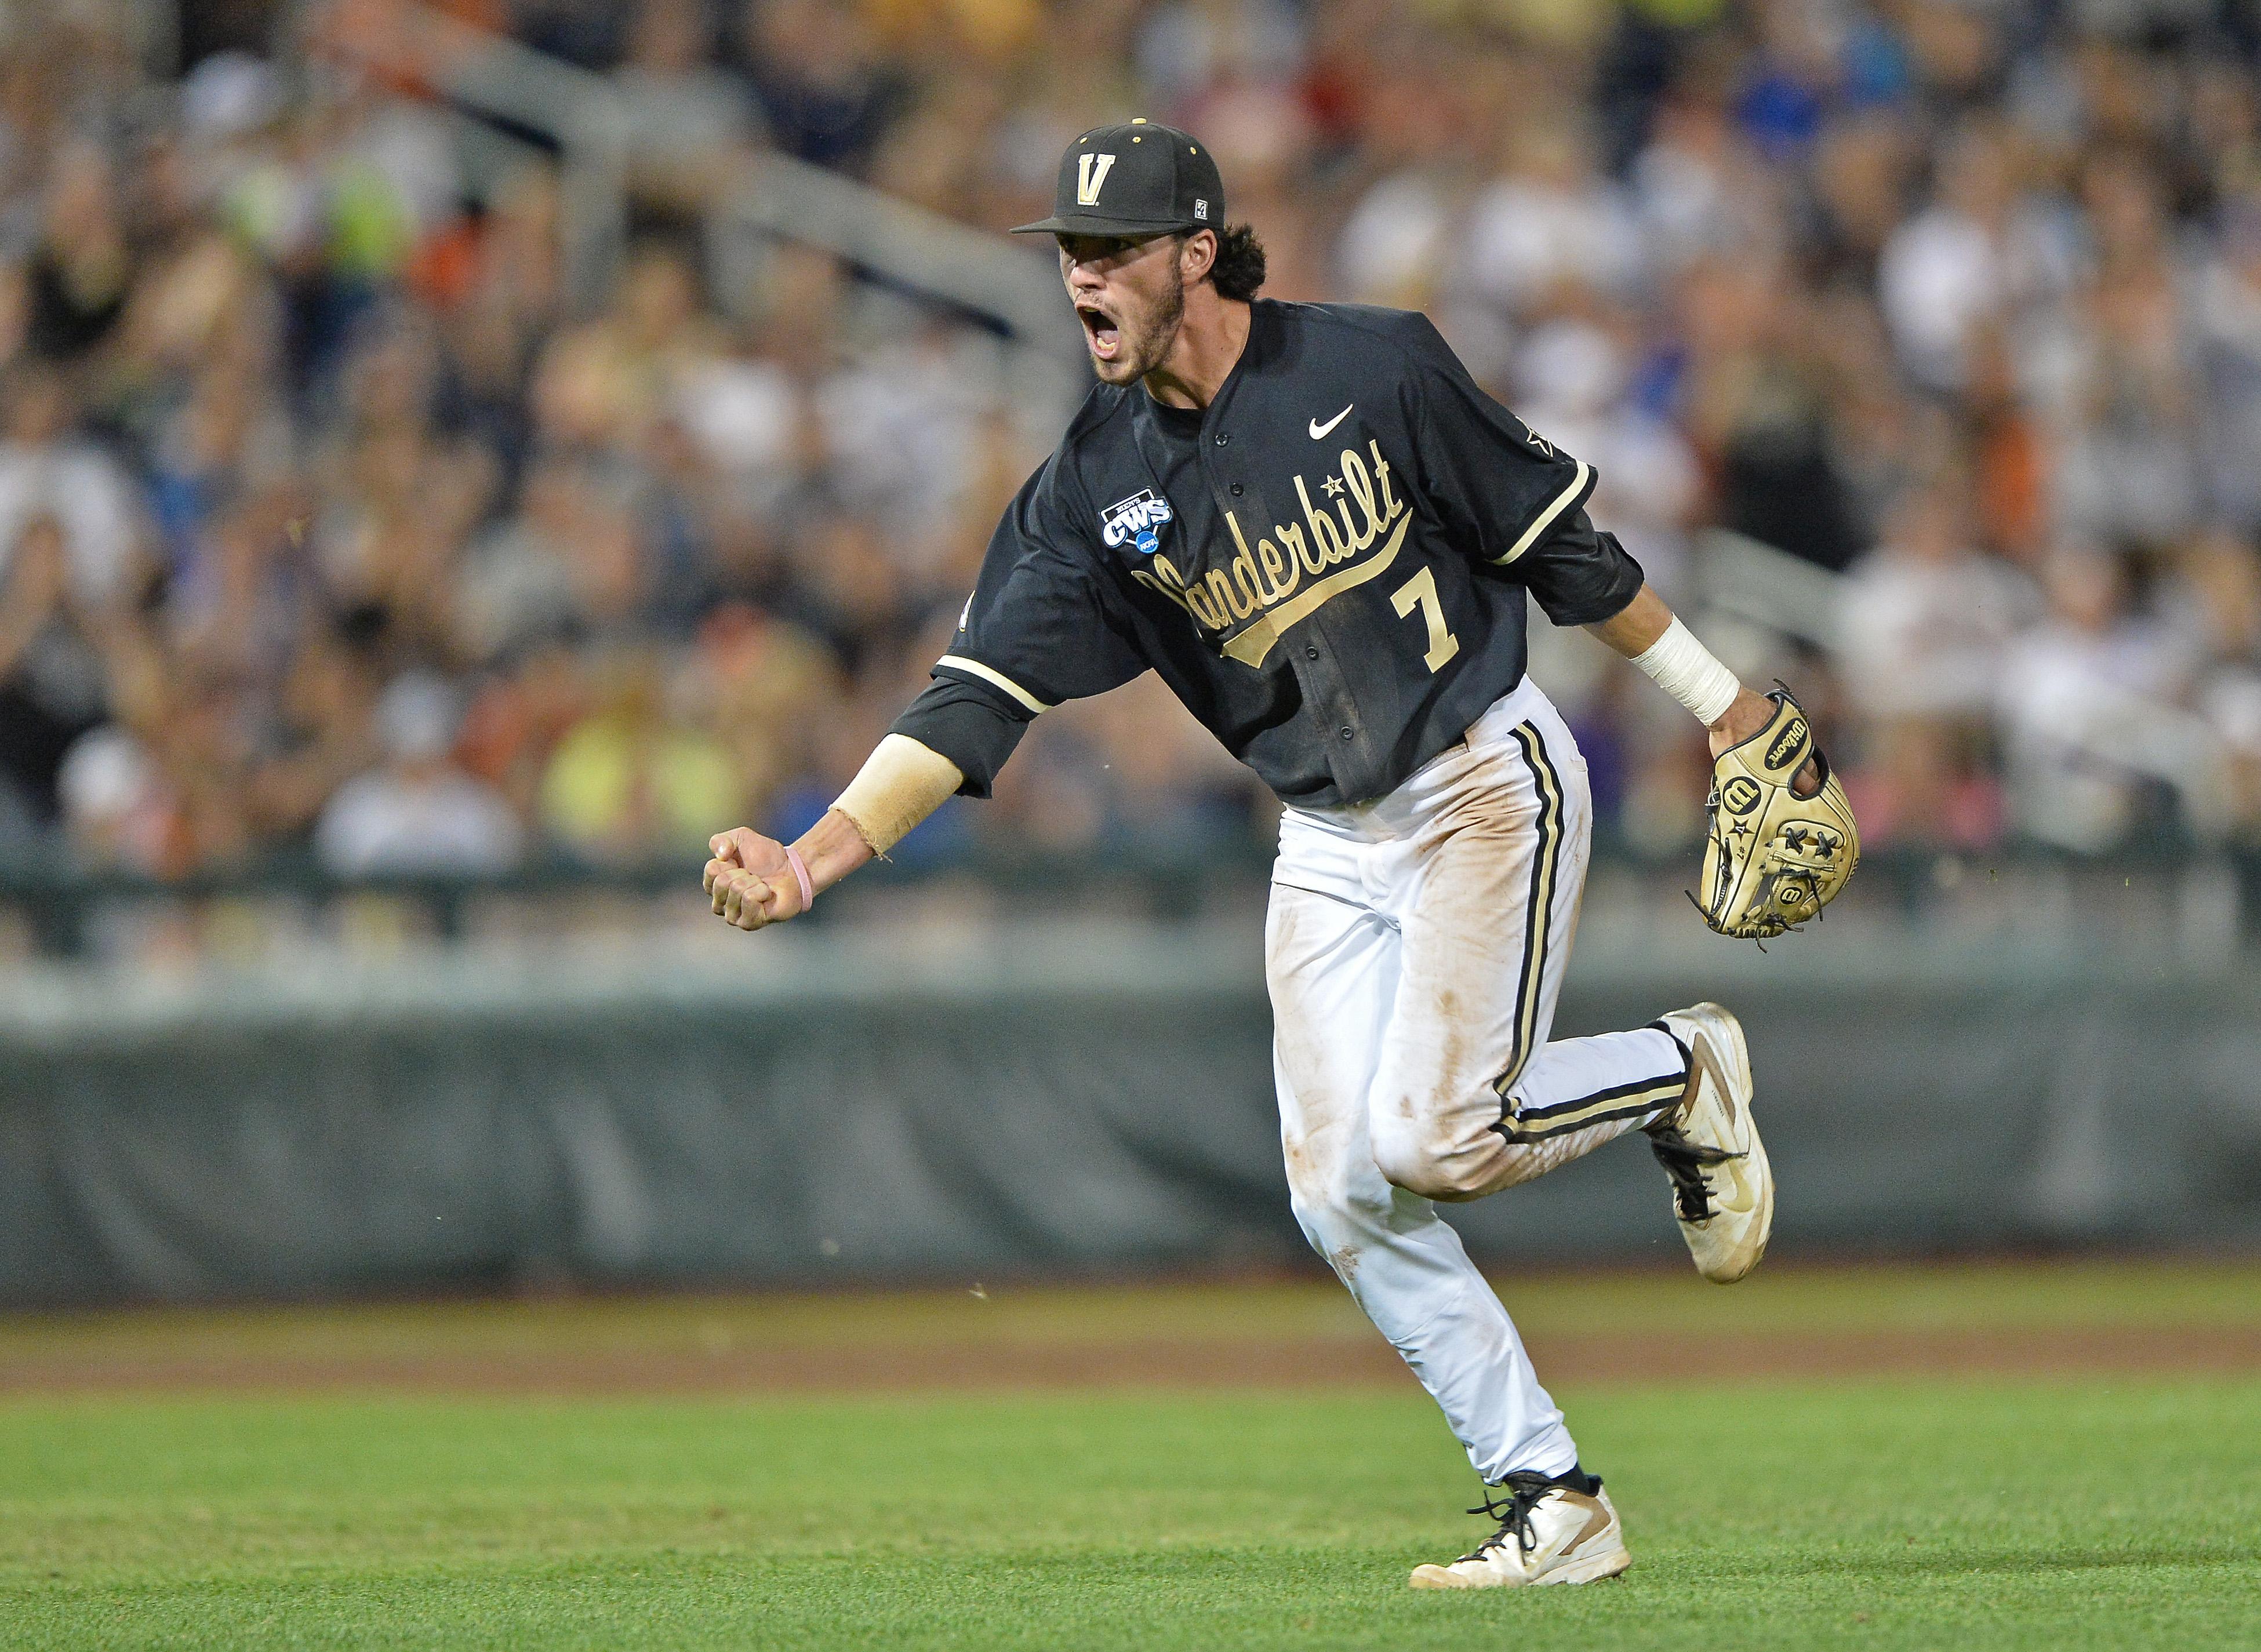 Vanderbilt infielder Dansby Swanson